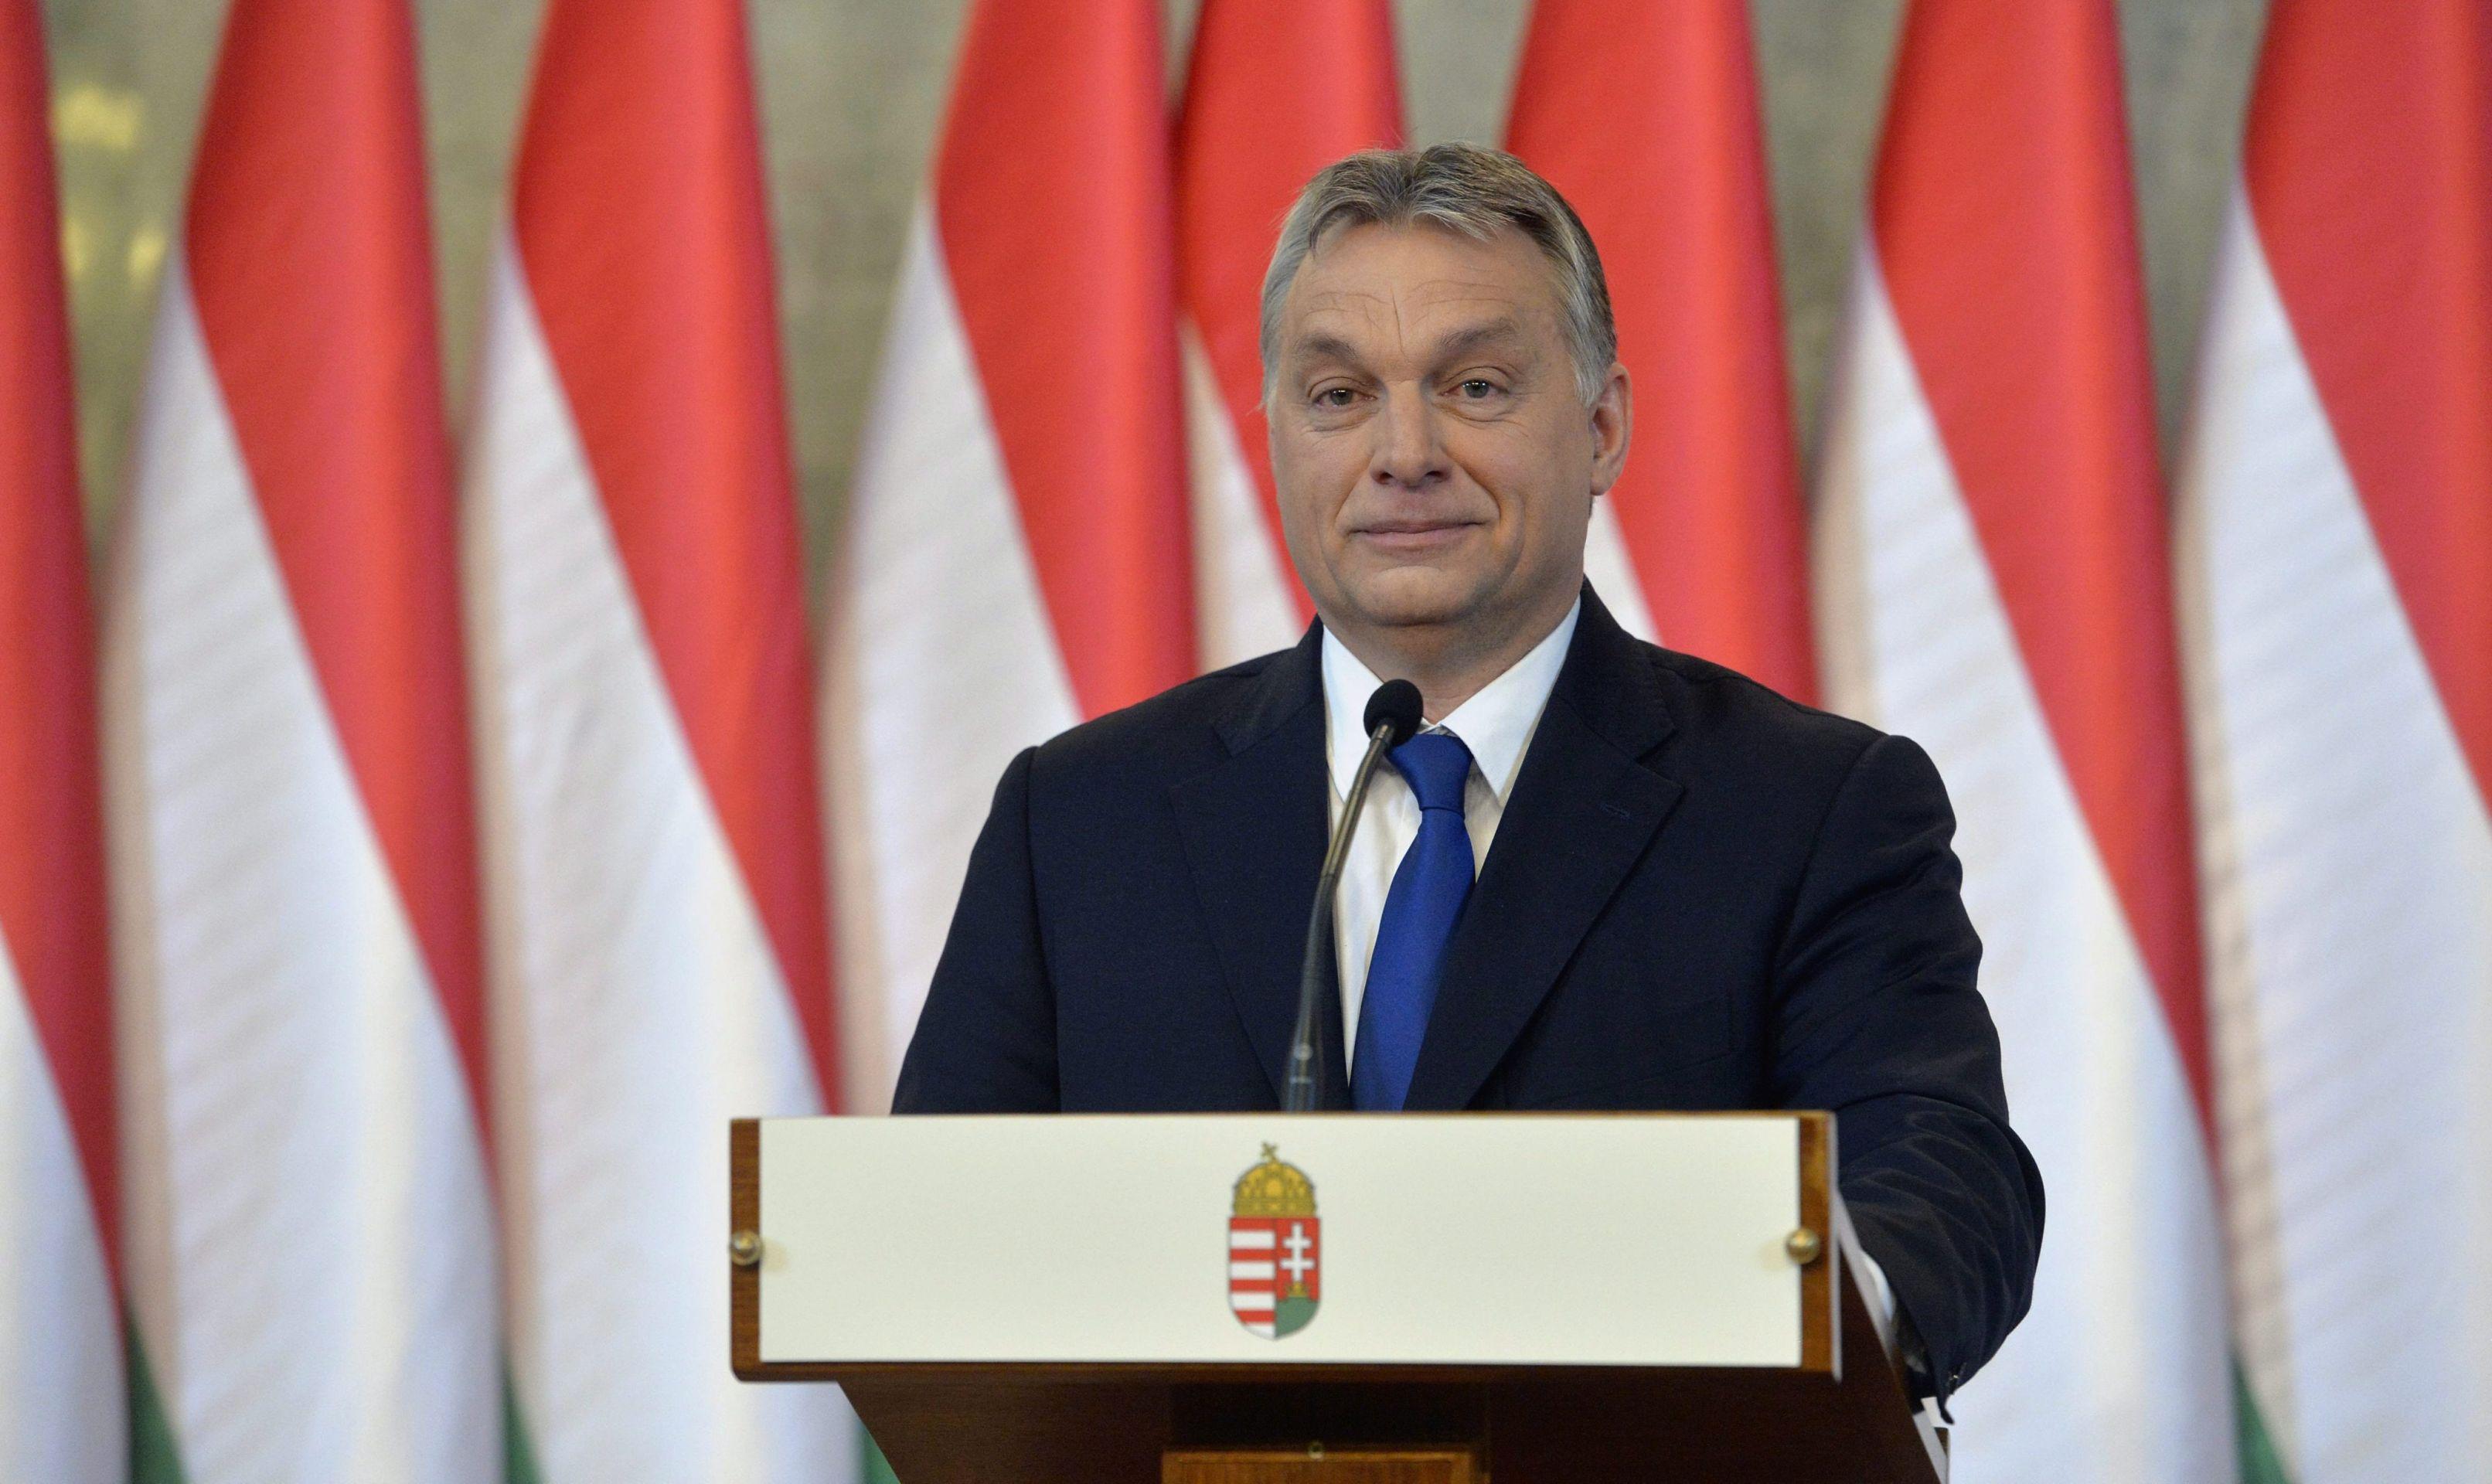 Mađarska pokrenula protueuropsku kampanju